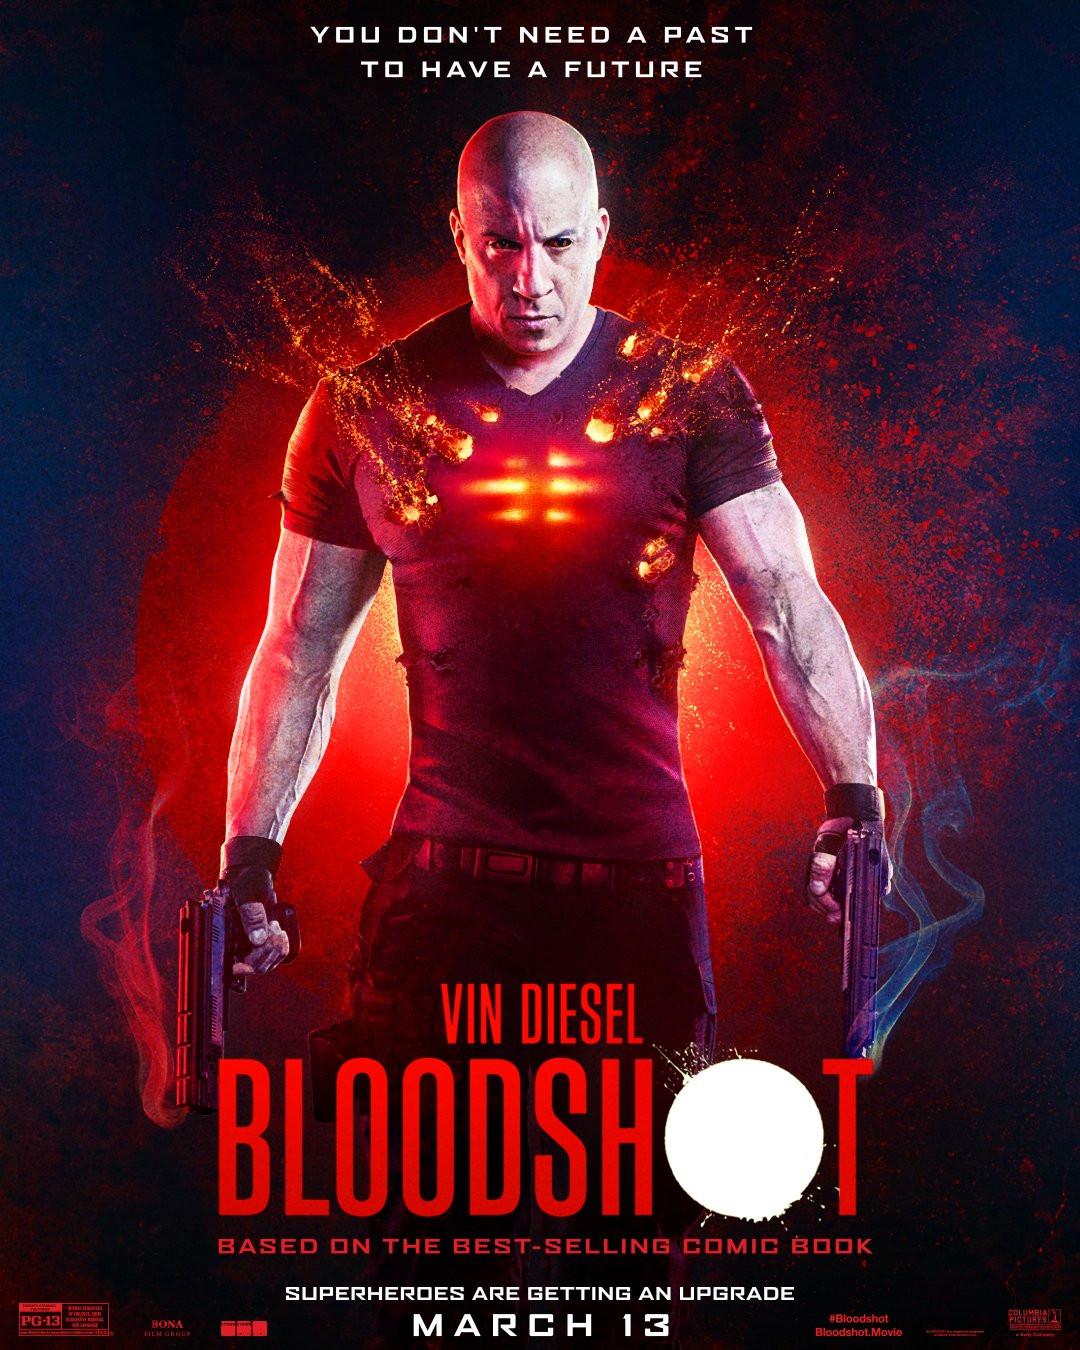 Vin Diesel Bloodshot poster